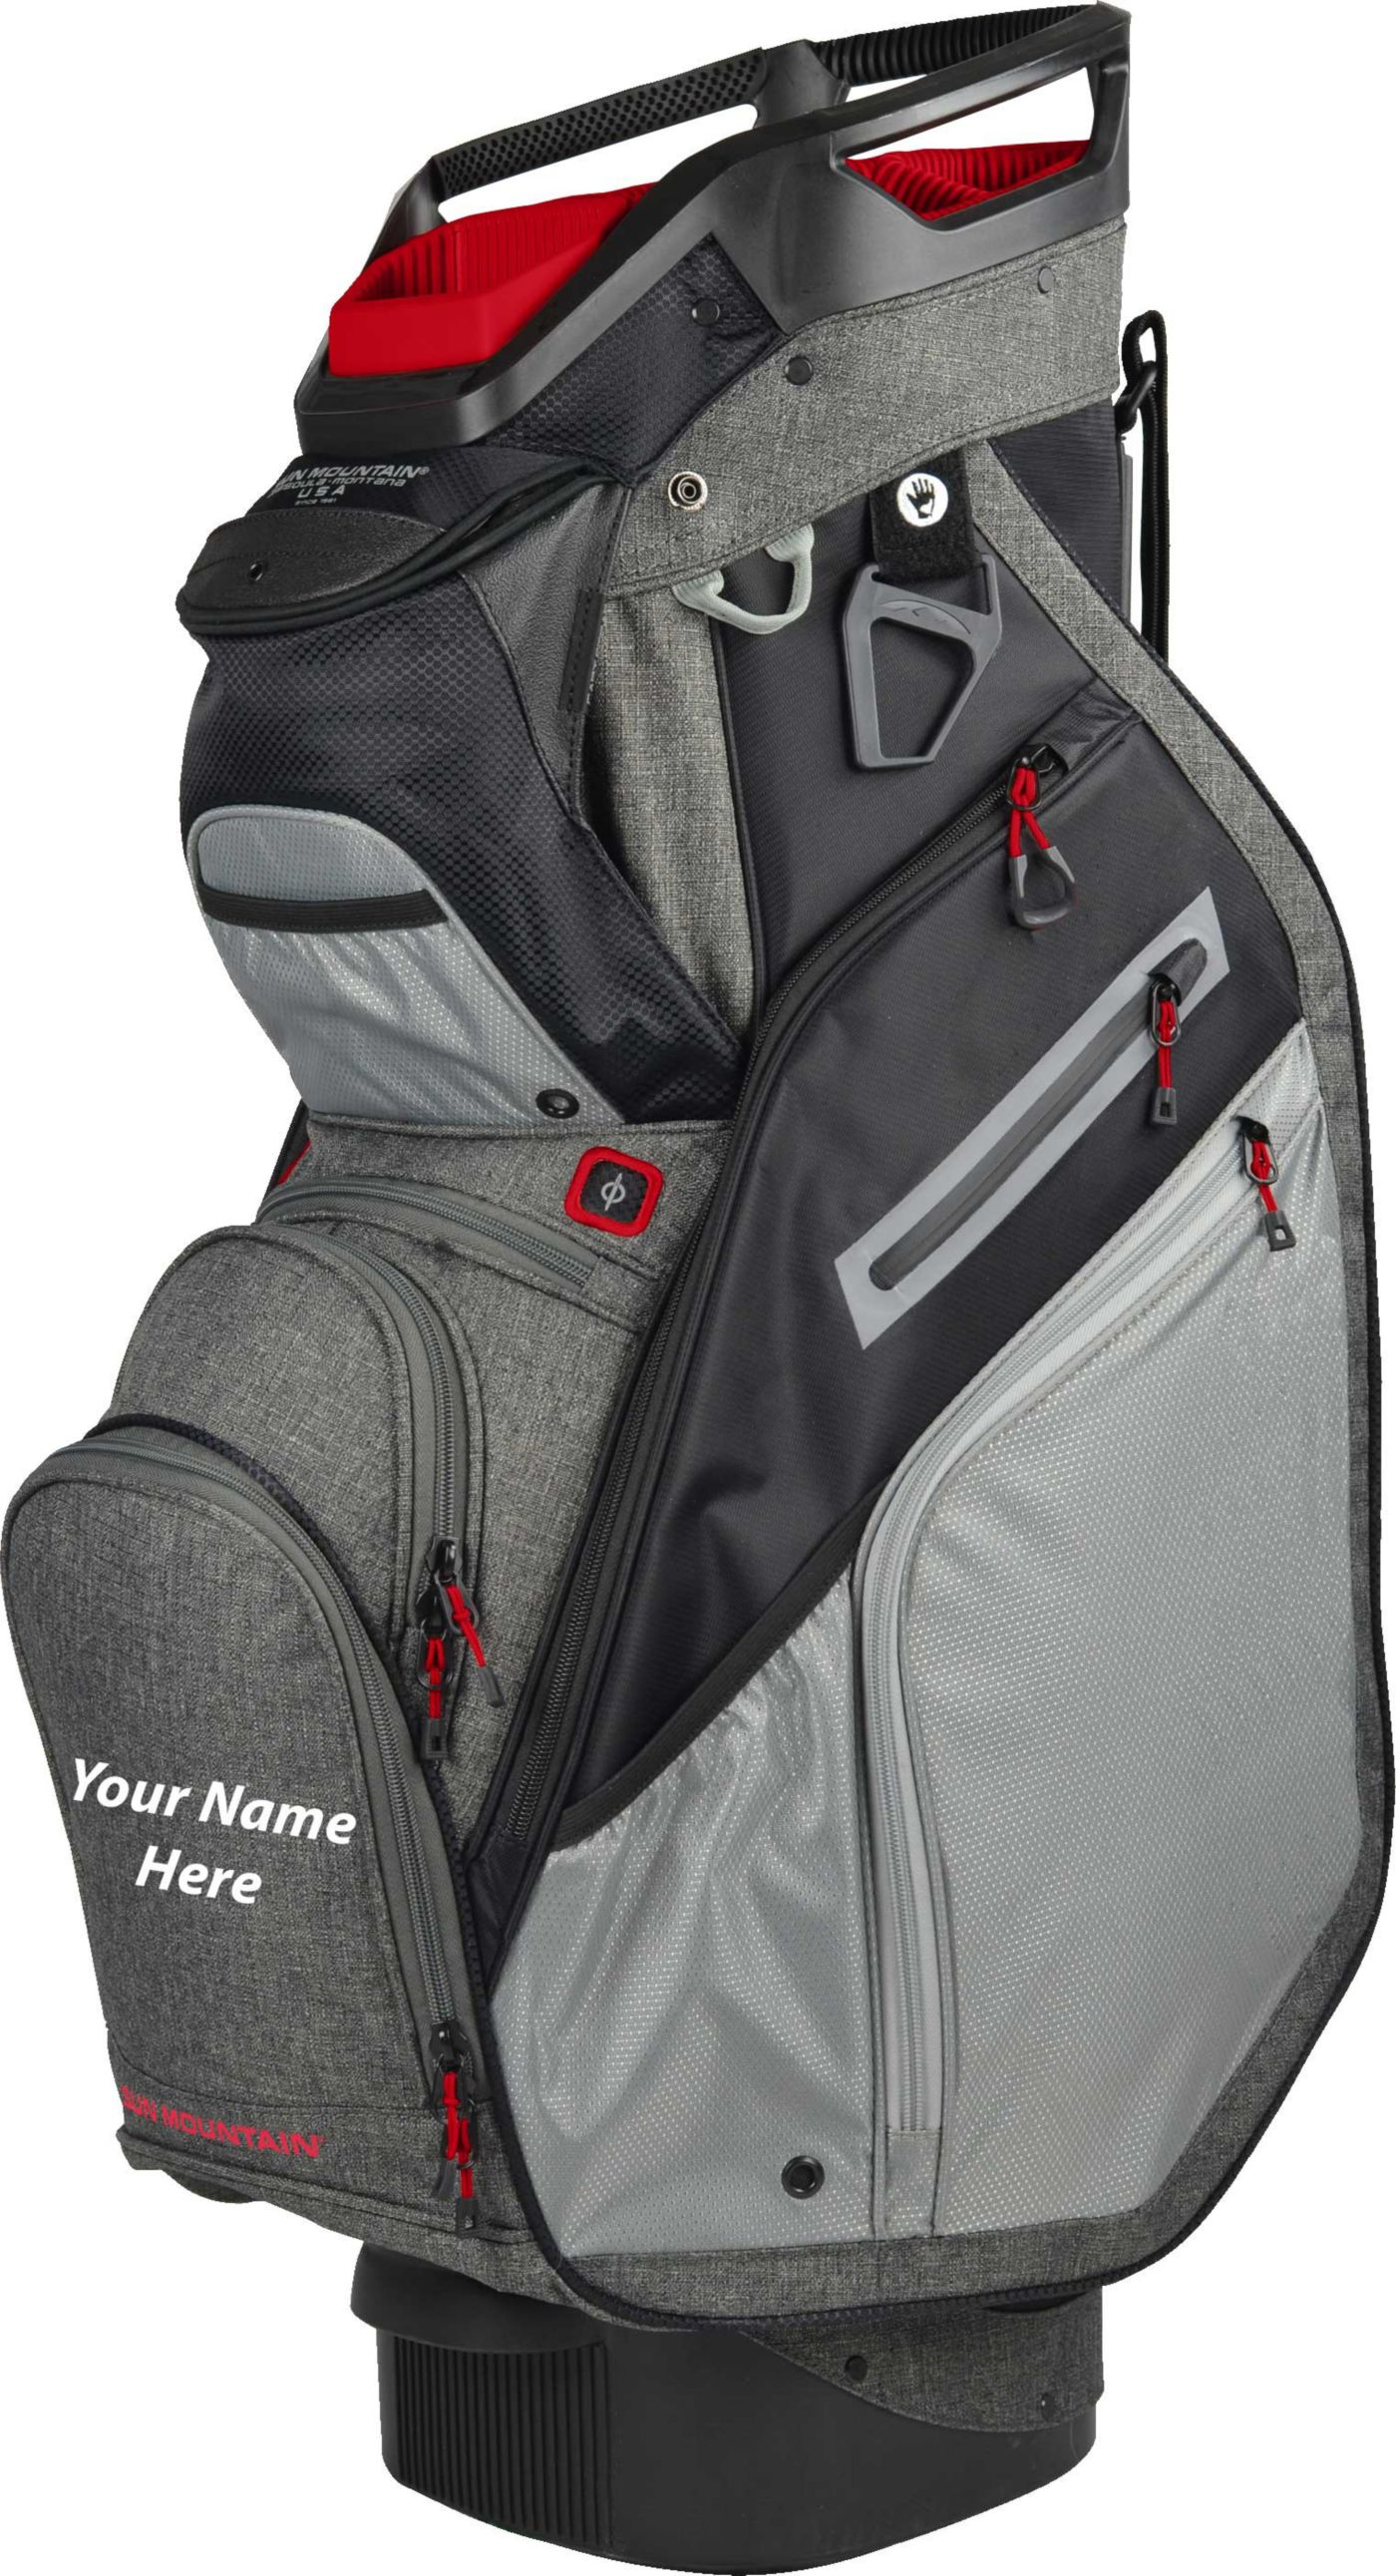 Sun Mountain 2020 C-130 Personalized Cart Golf Bag